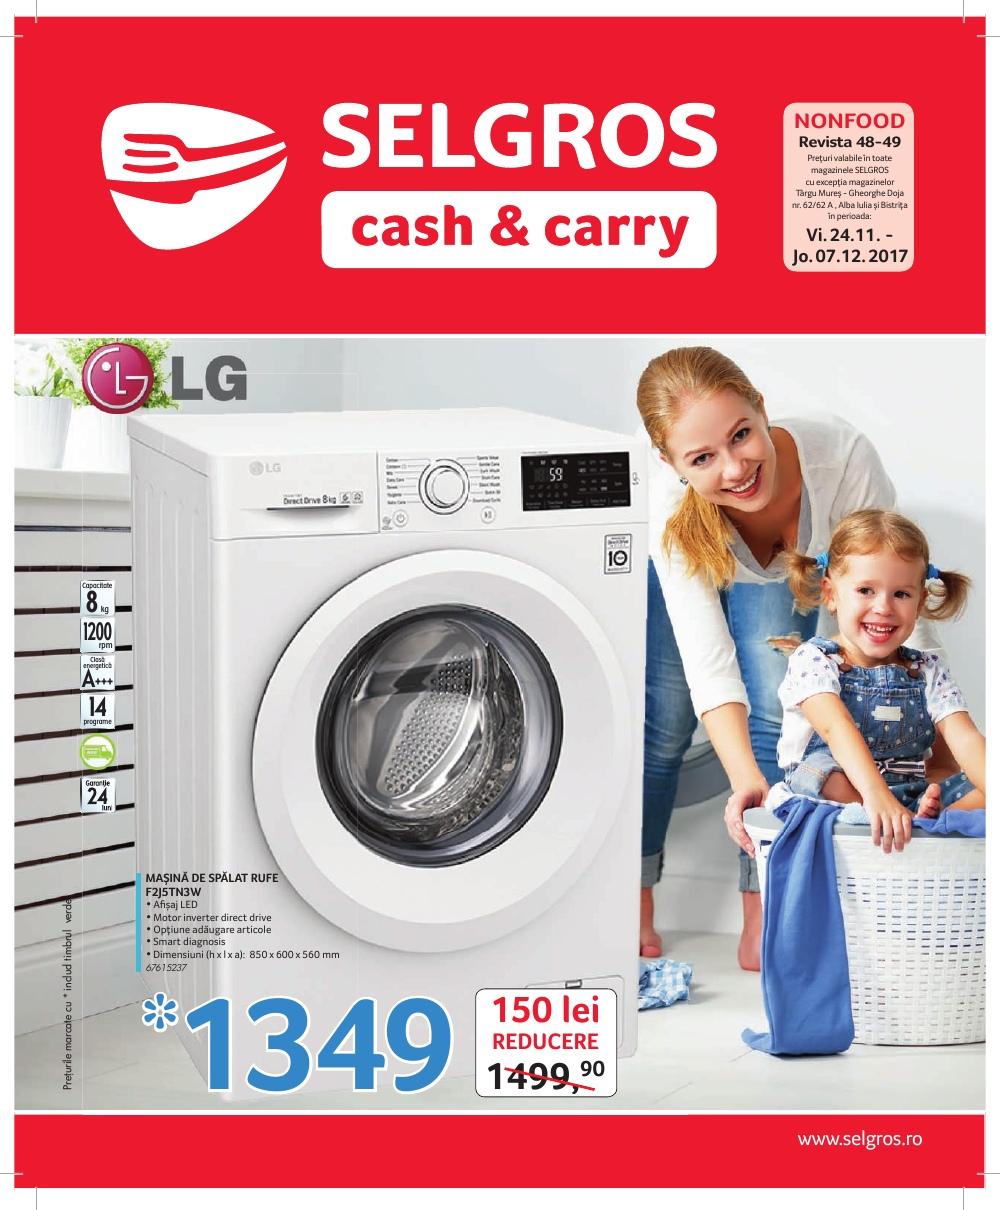 Catalog Selgros 24 noiembrie - 7 decembrie 2017. Oferte nealimentare